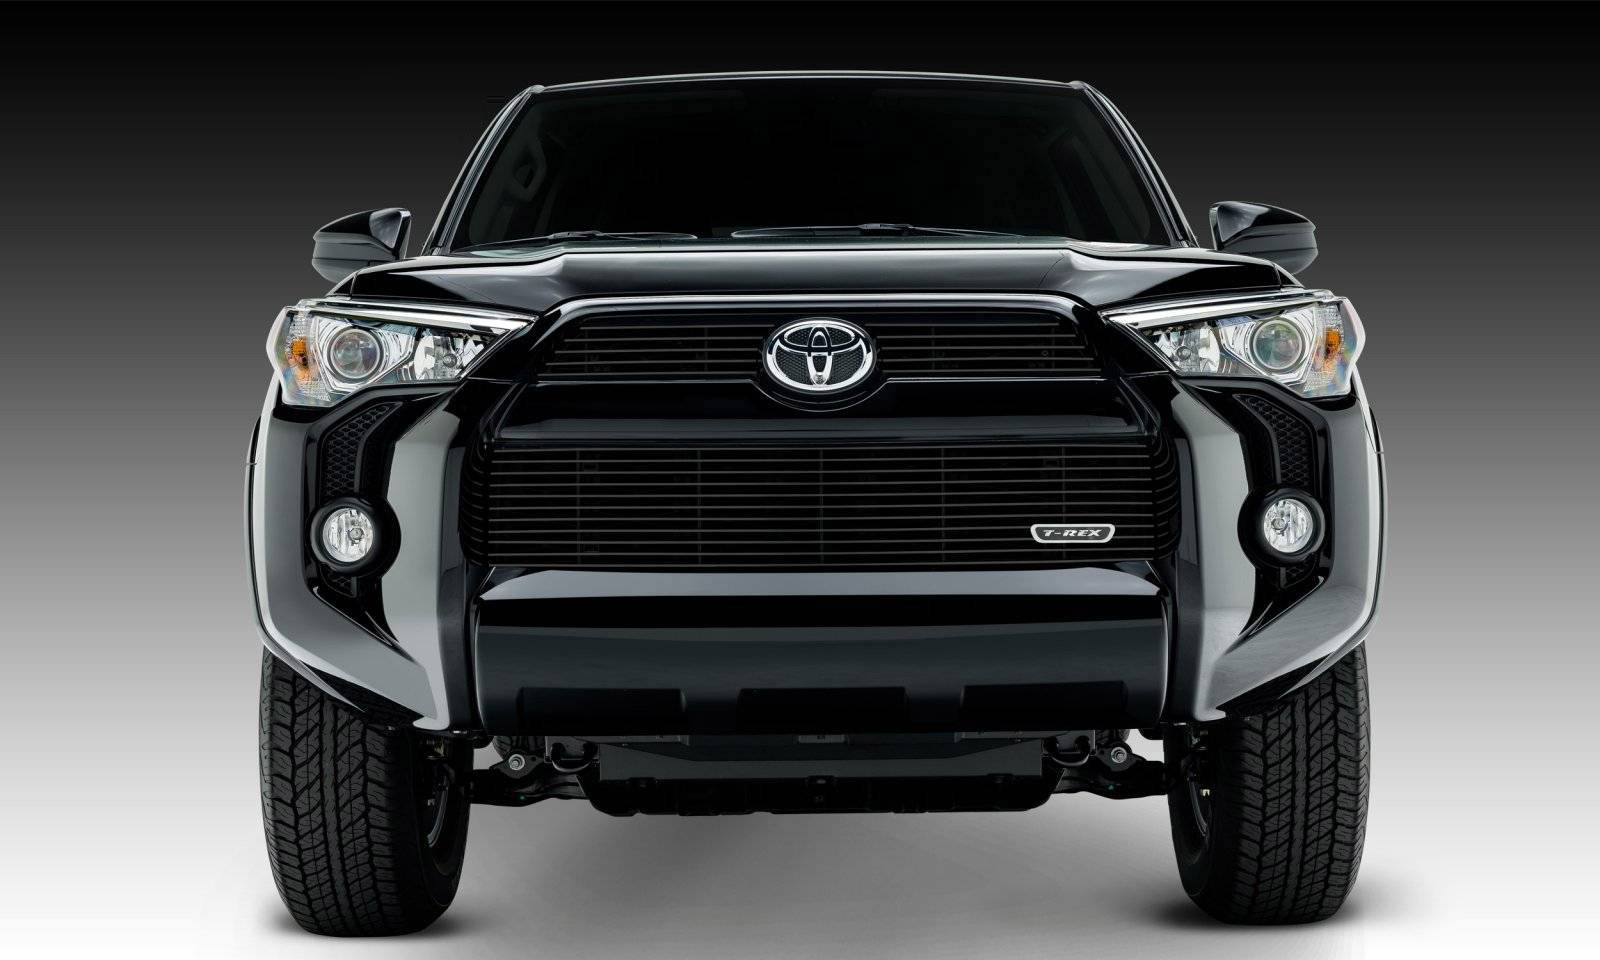 T-REX Grilles - 2014-2019 Toyota 4Runner Billet Grille, Black, 3 Pc, Overlay - PN #21949B